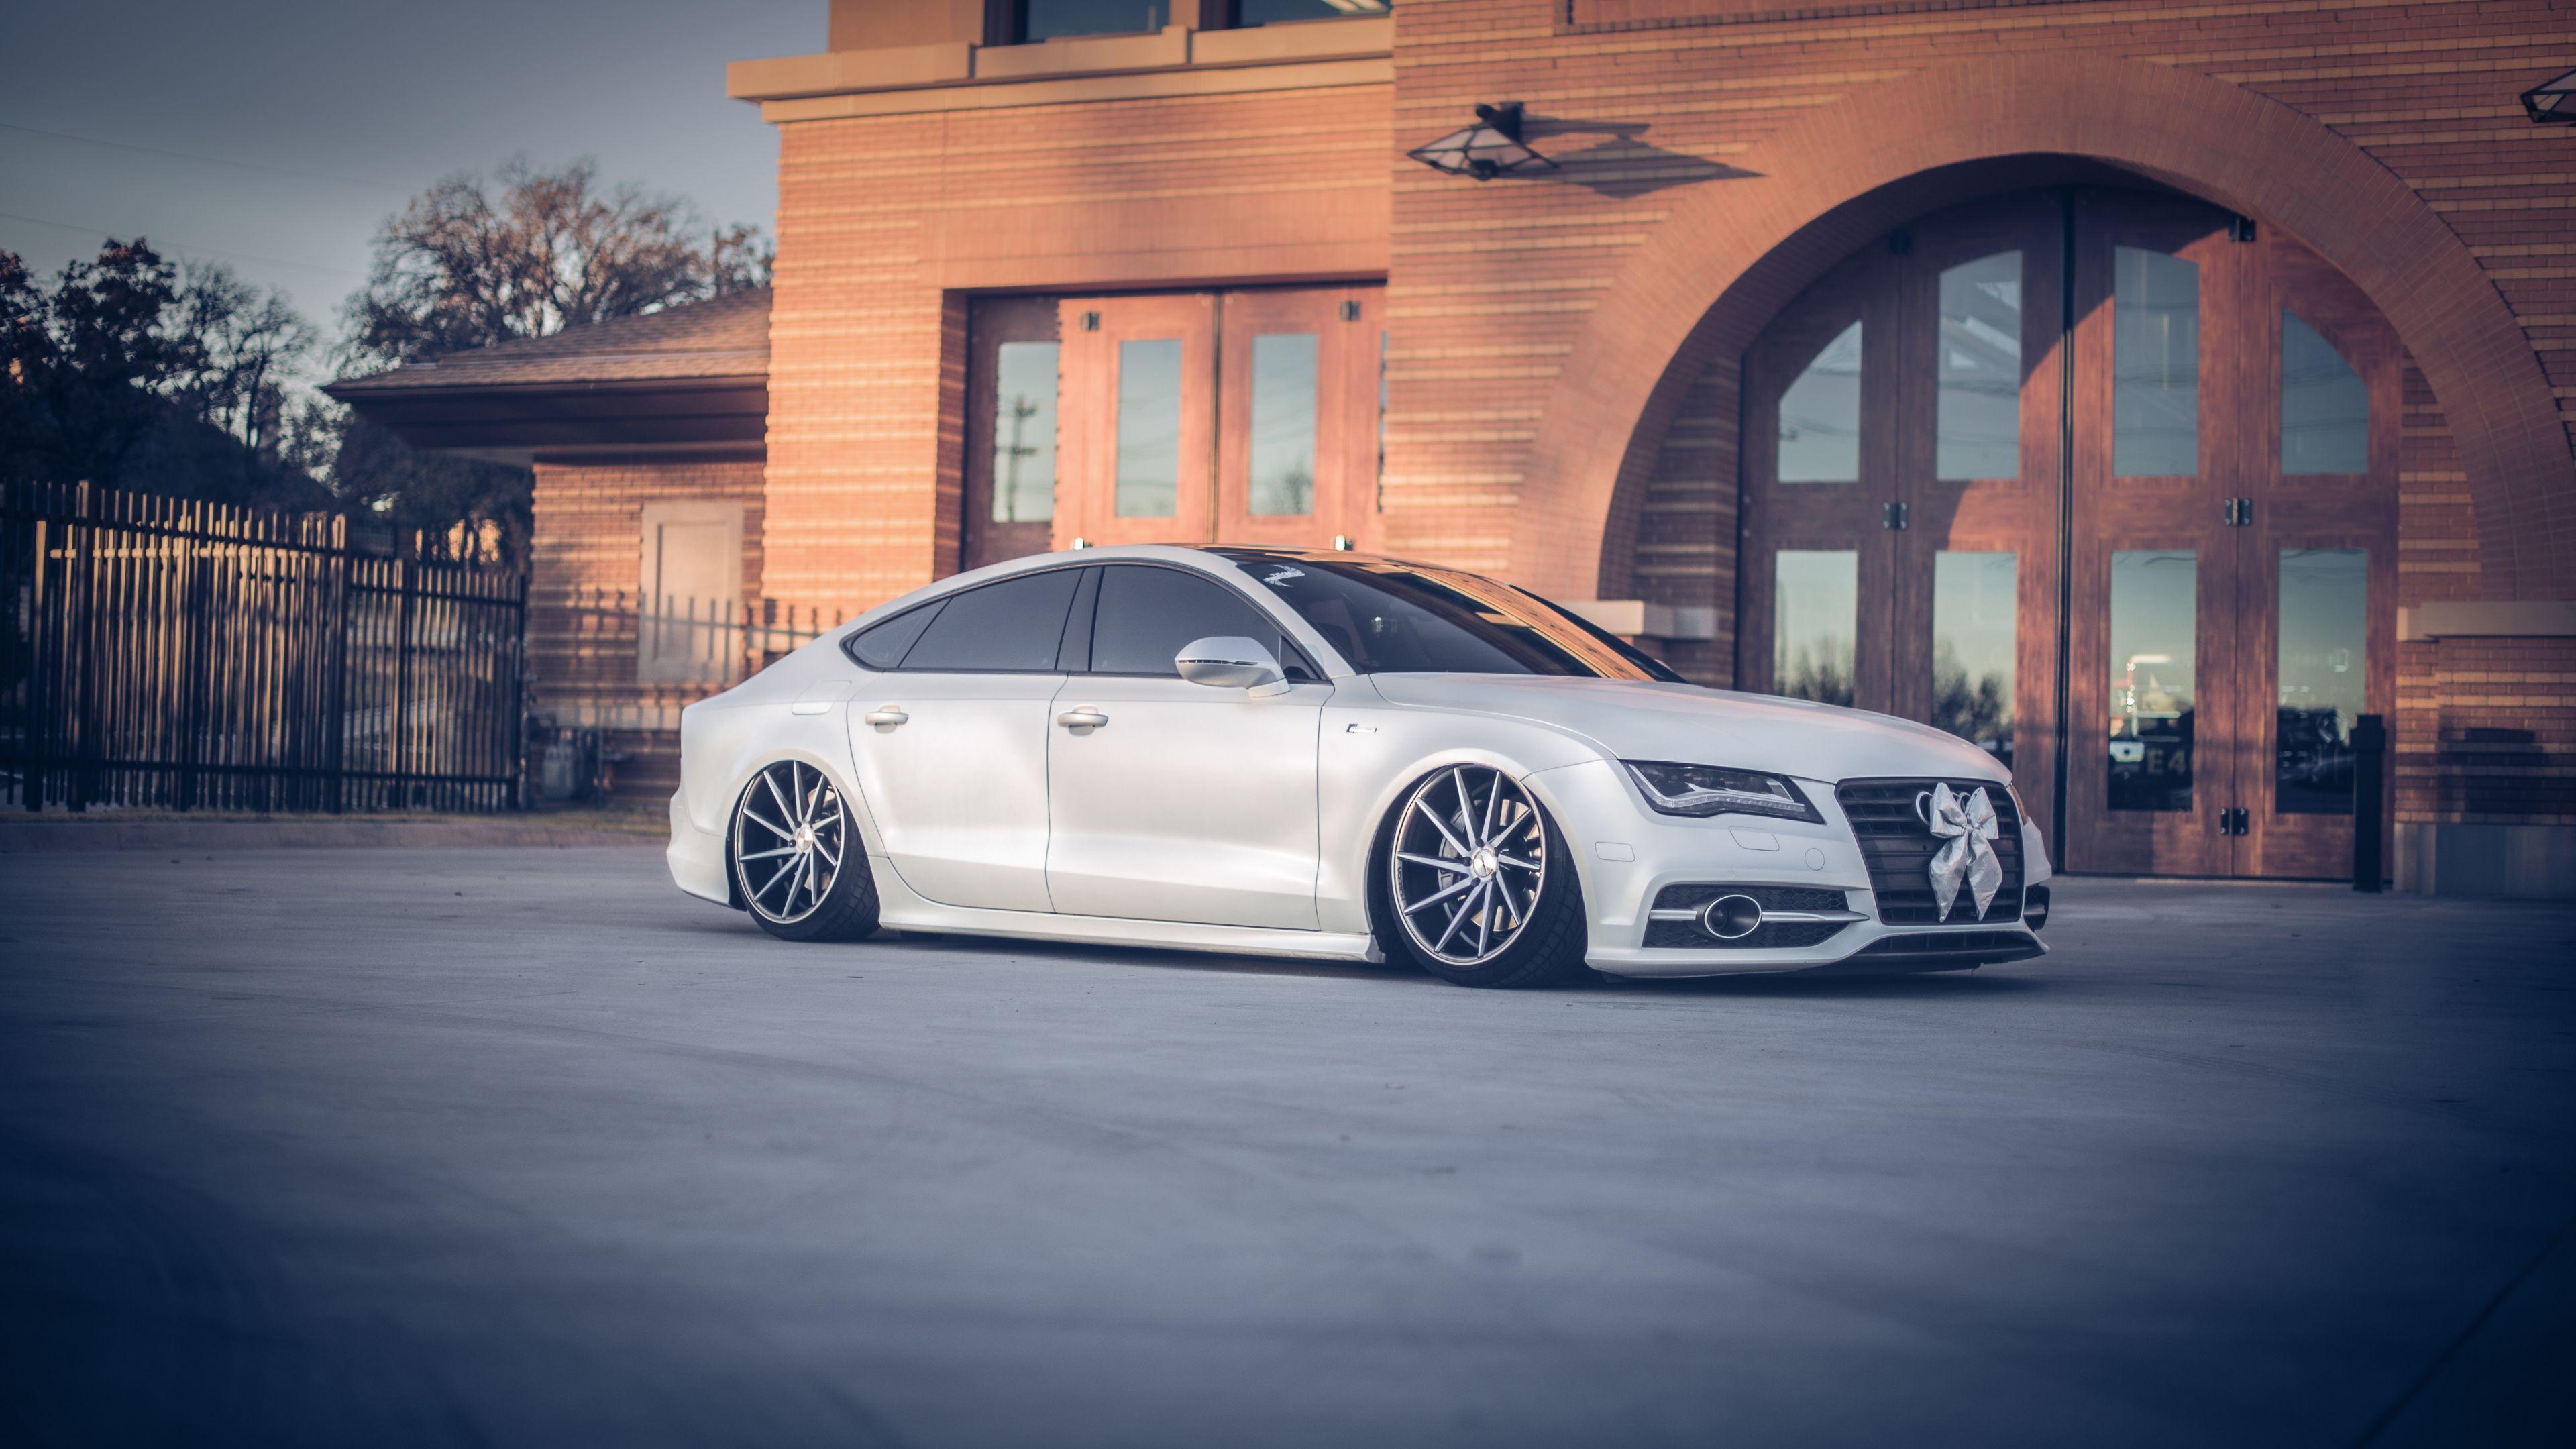 Audi 4K Wallpapers - Top Free Audi 4K Backgrounds